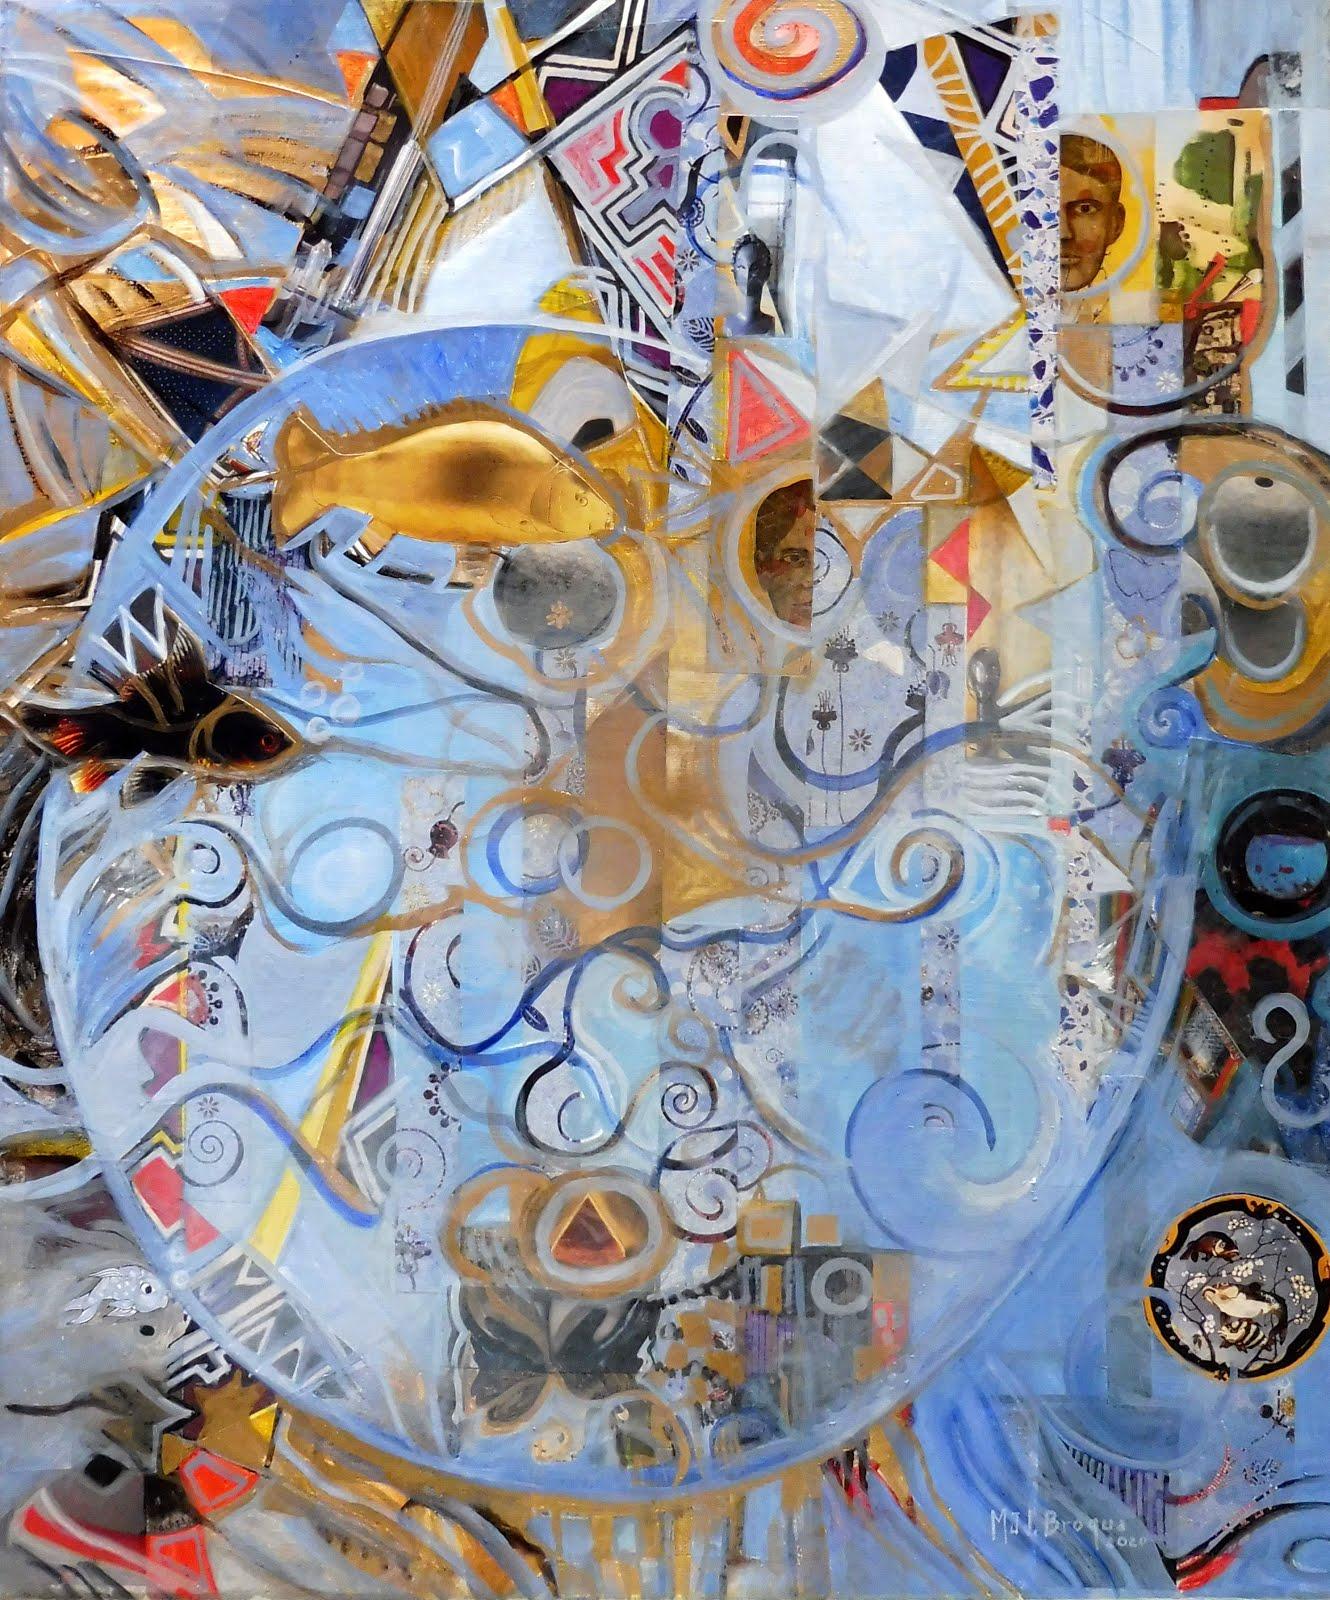 Bulles de rêves - 46 x 55 cm - 2020